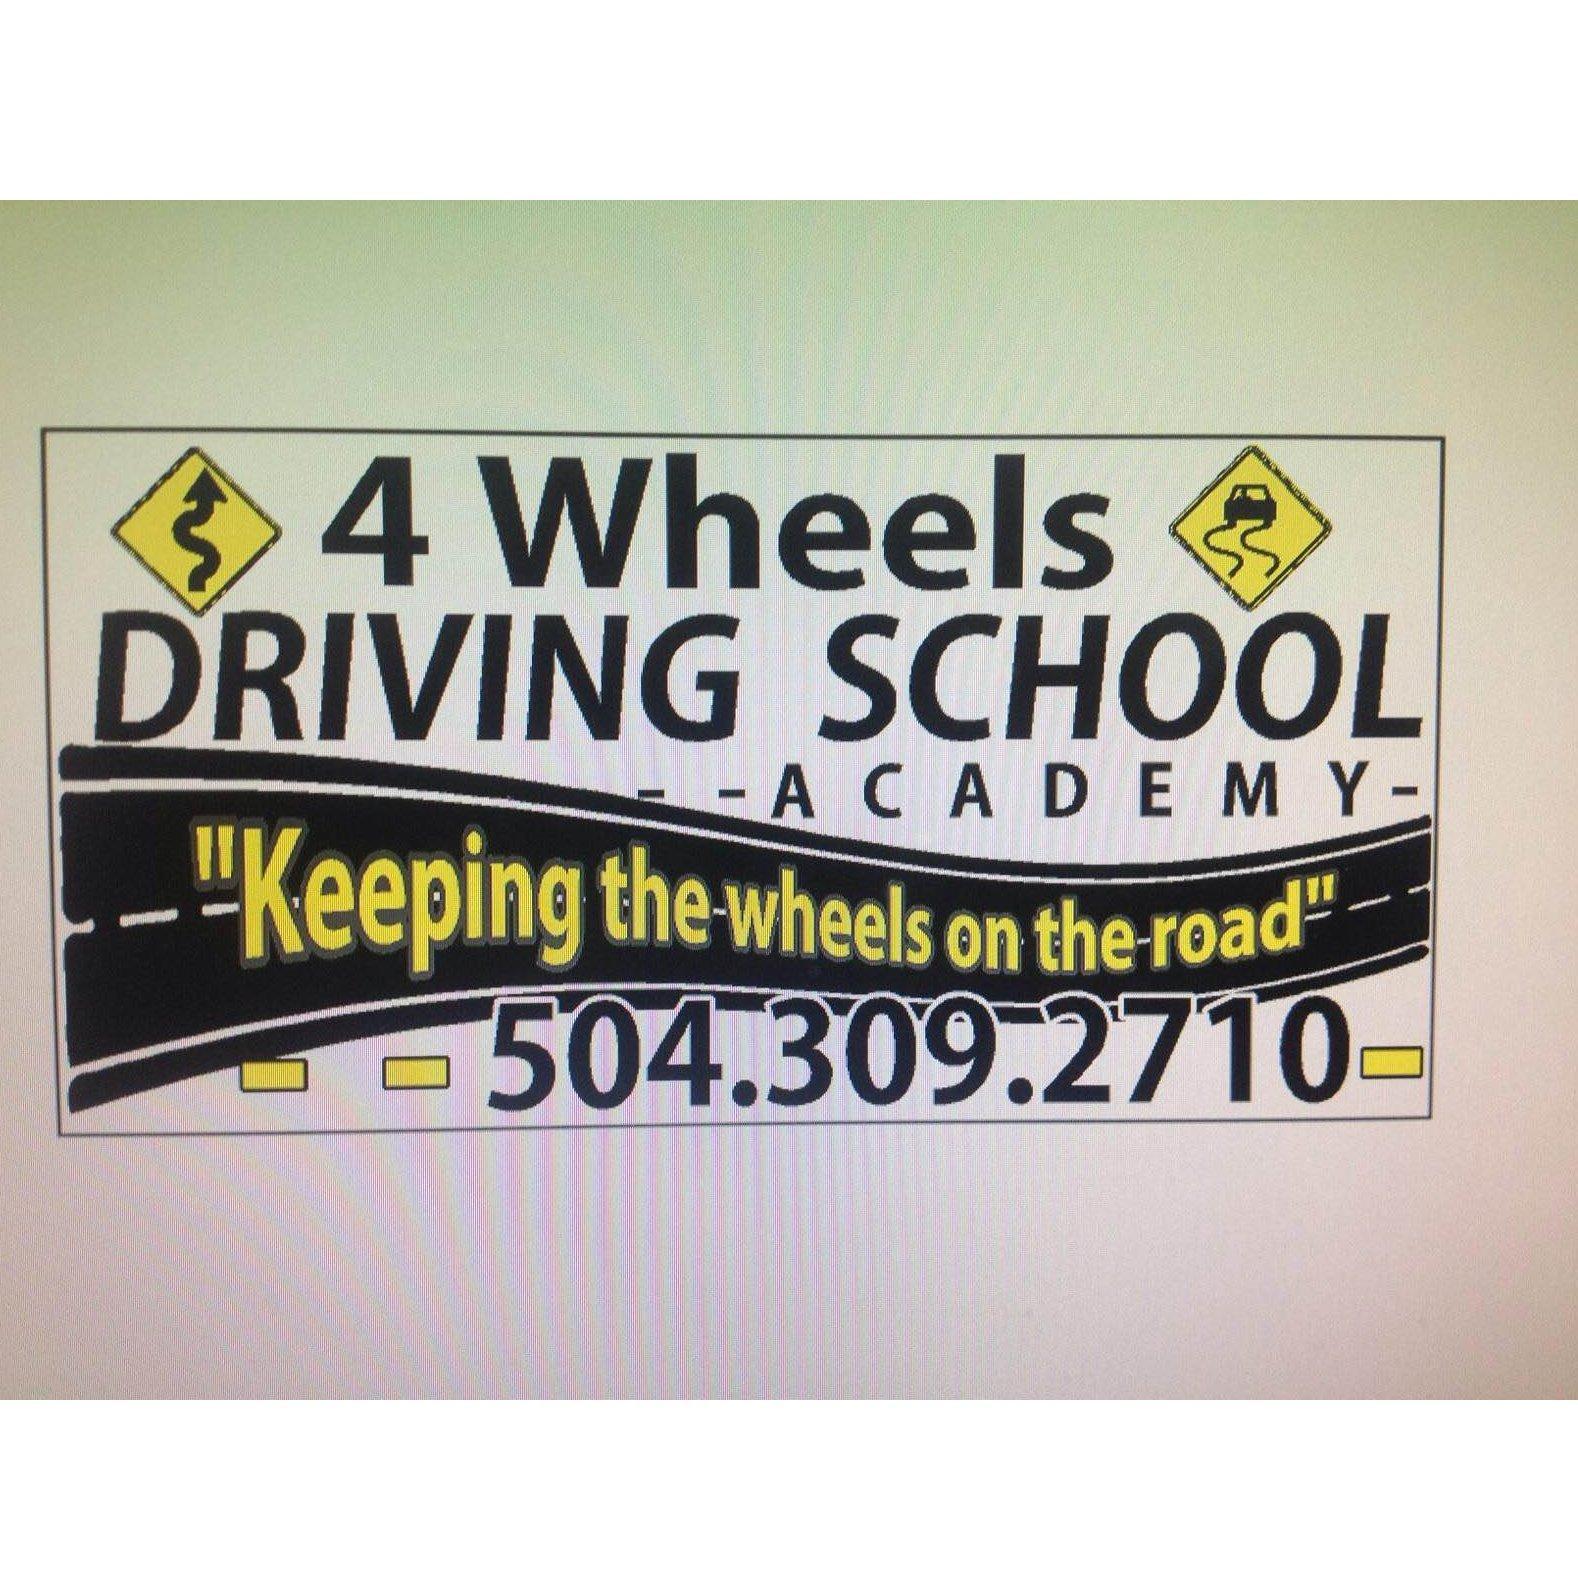 4 Wheels Driving School Academy - New Orleans, LA - Driving Schools